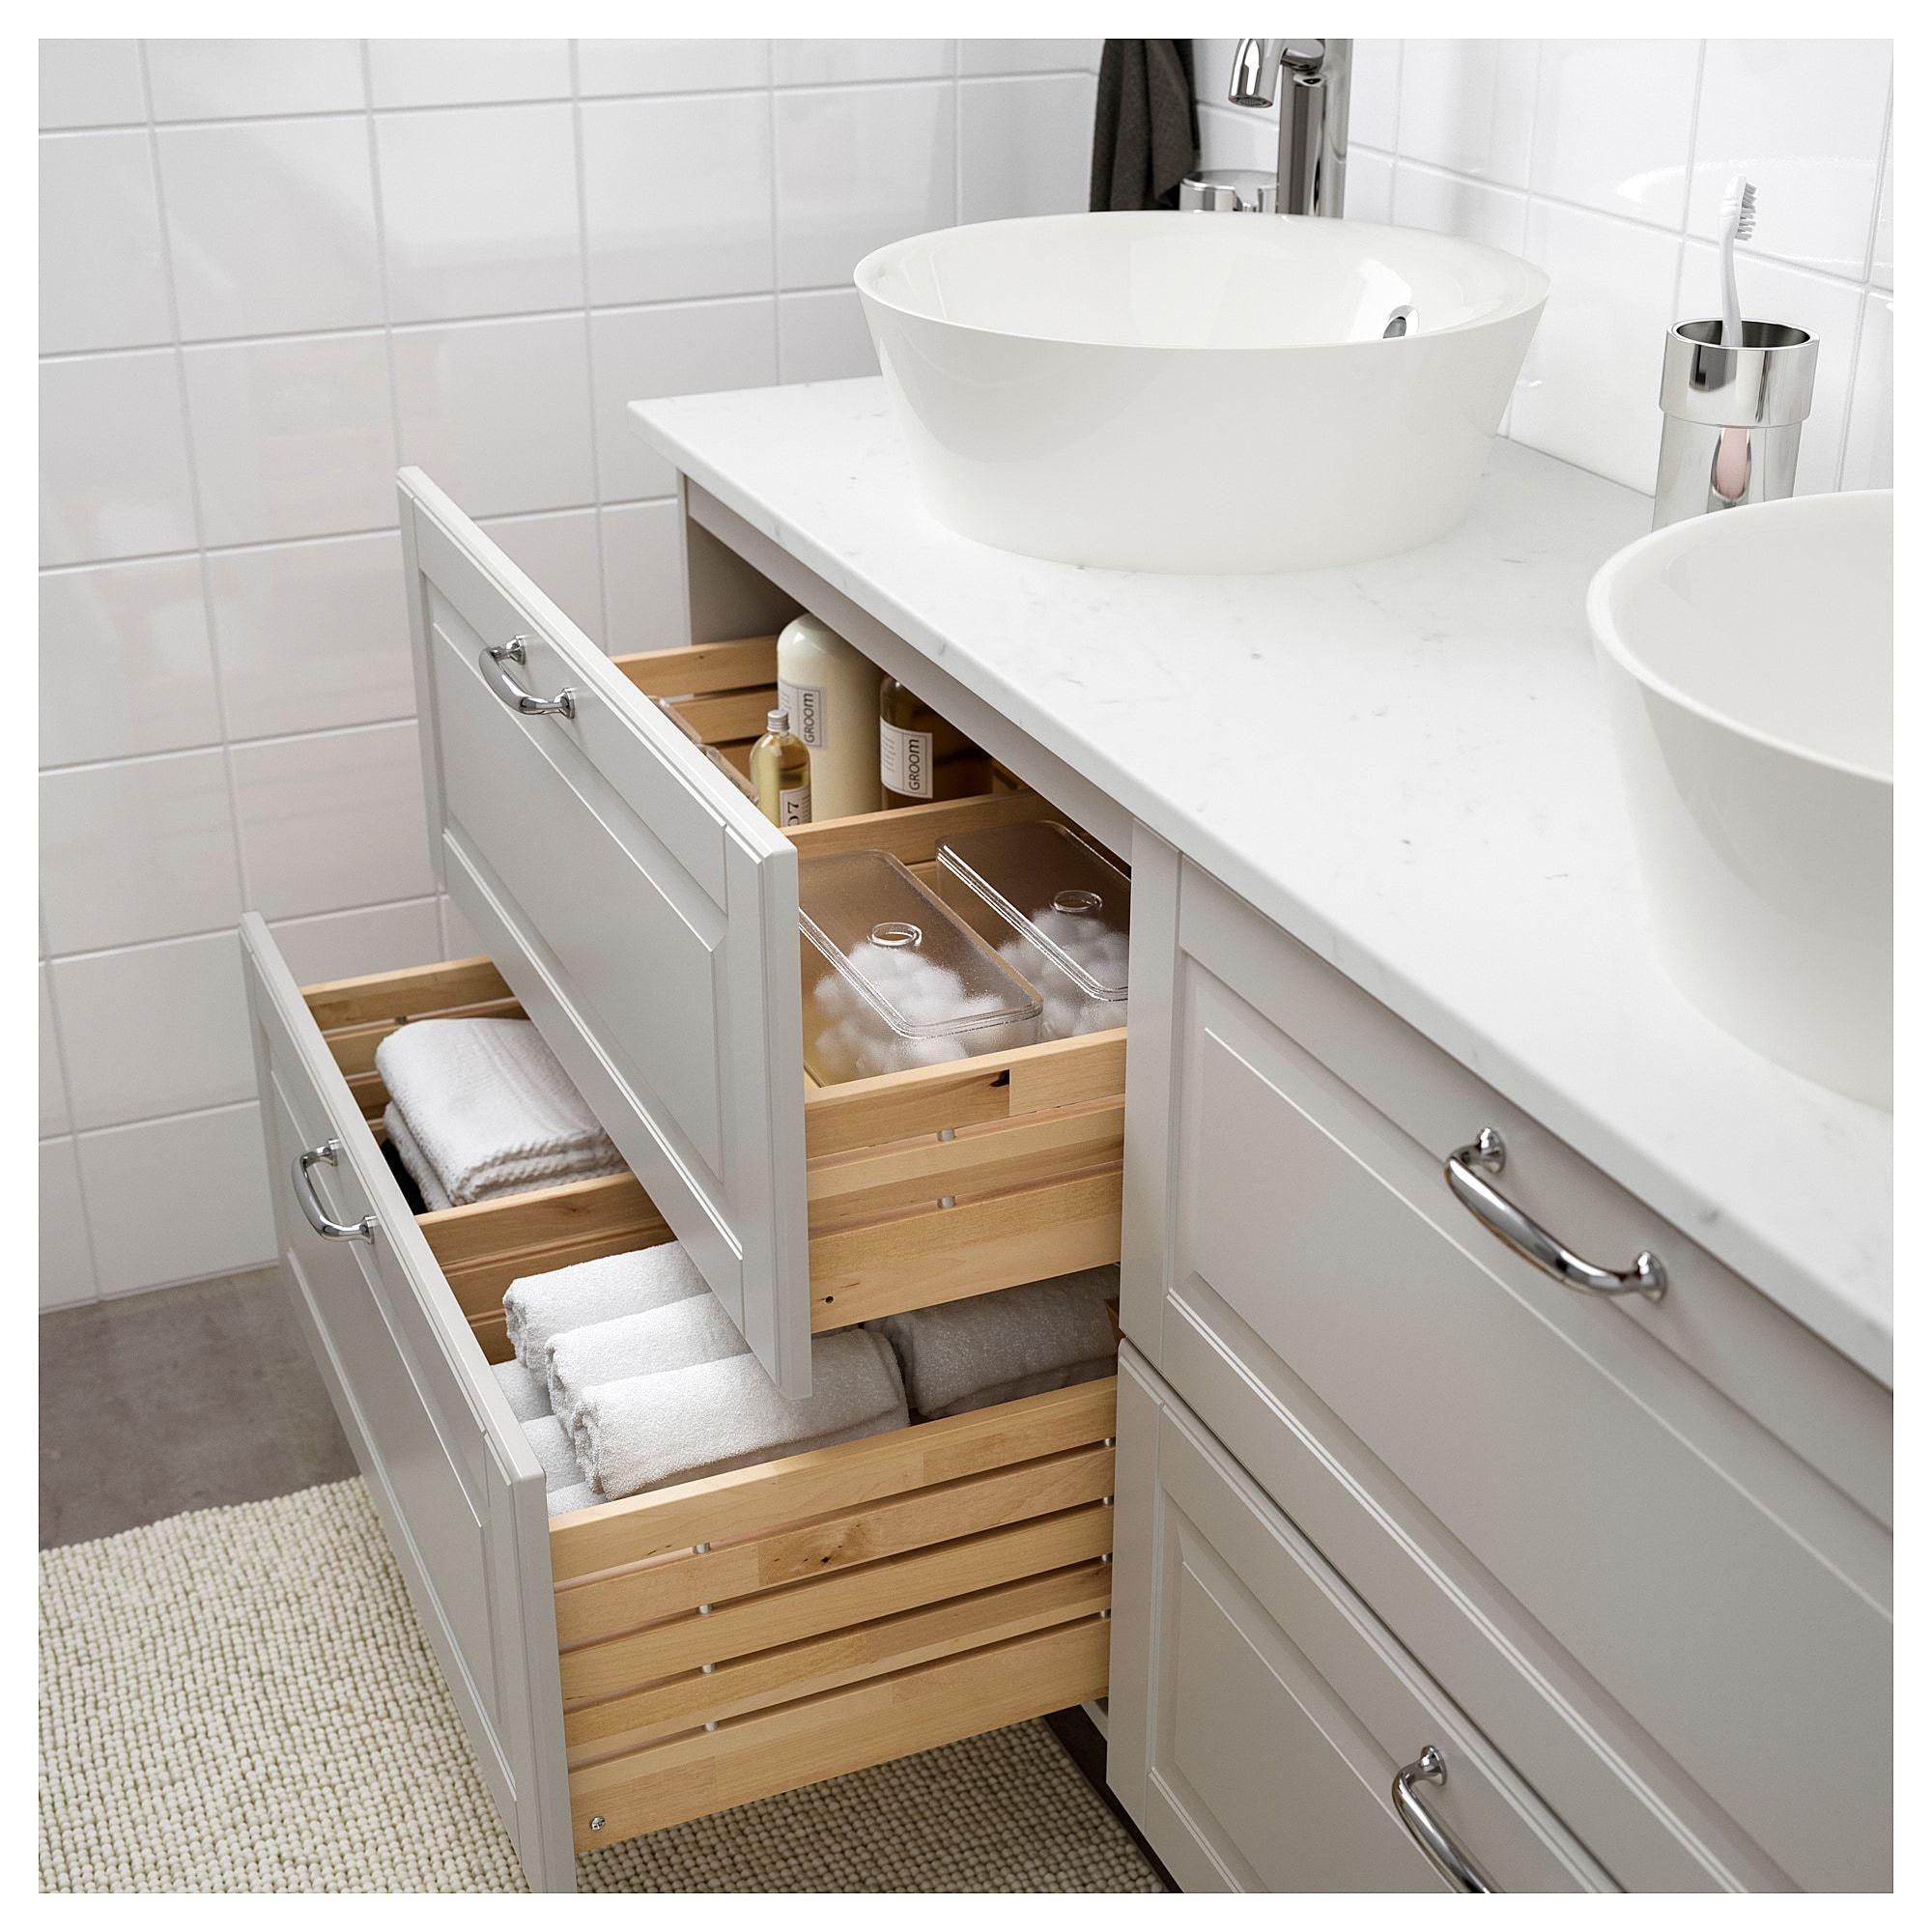 Furniture Home Furnishings Find Your Inspiration Ikea Godmorgon Sink Cabinet Ikea